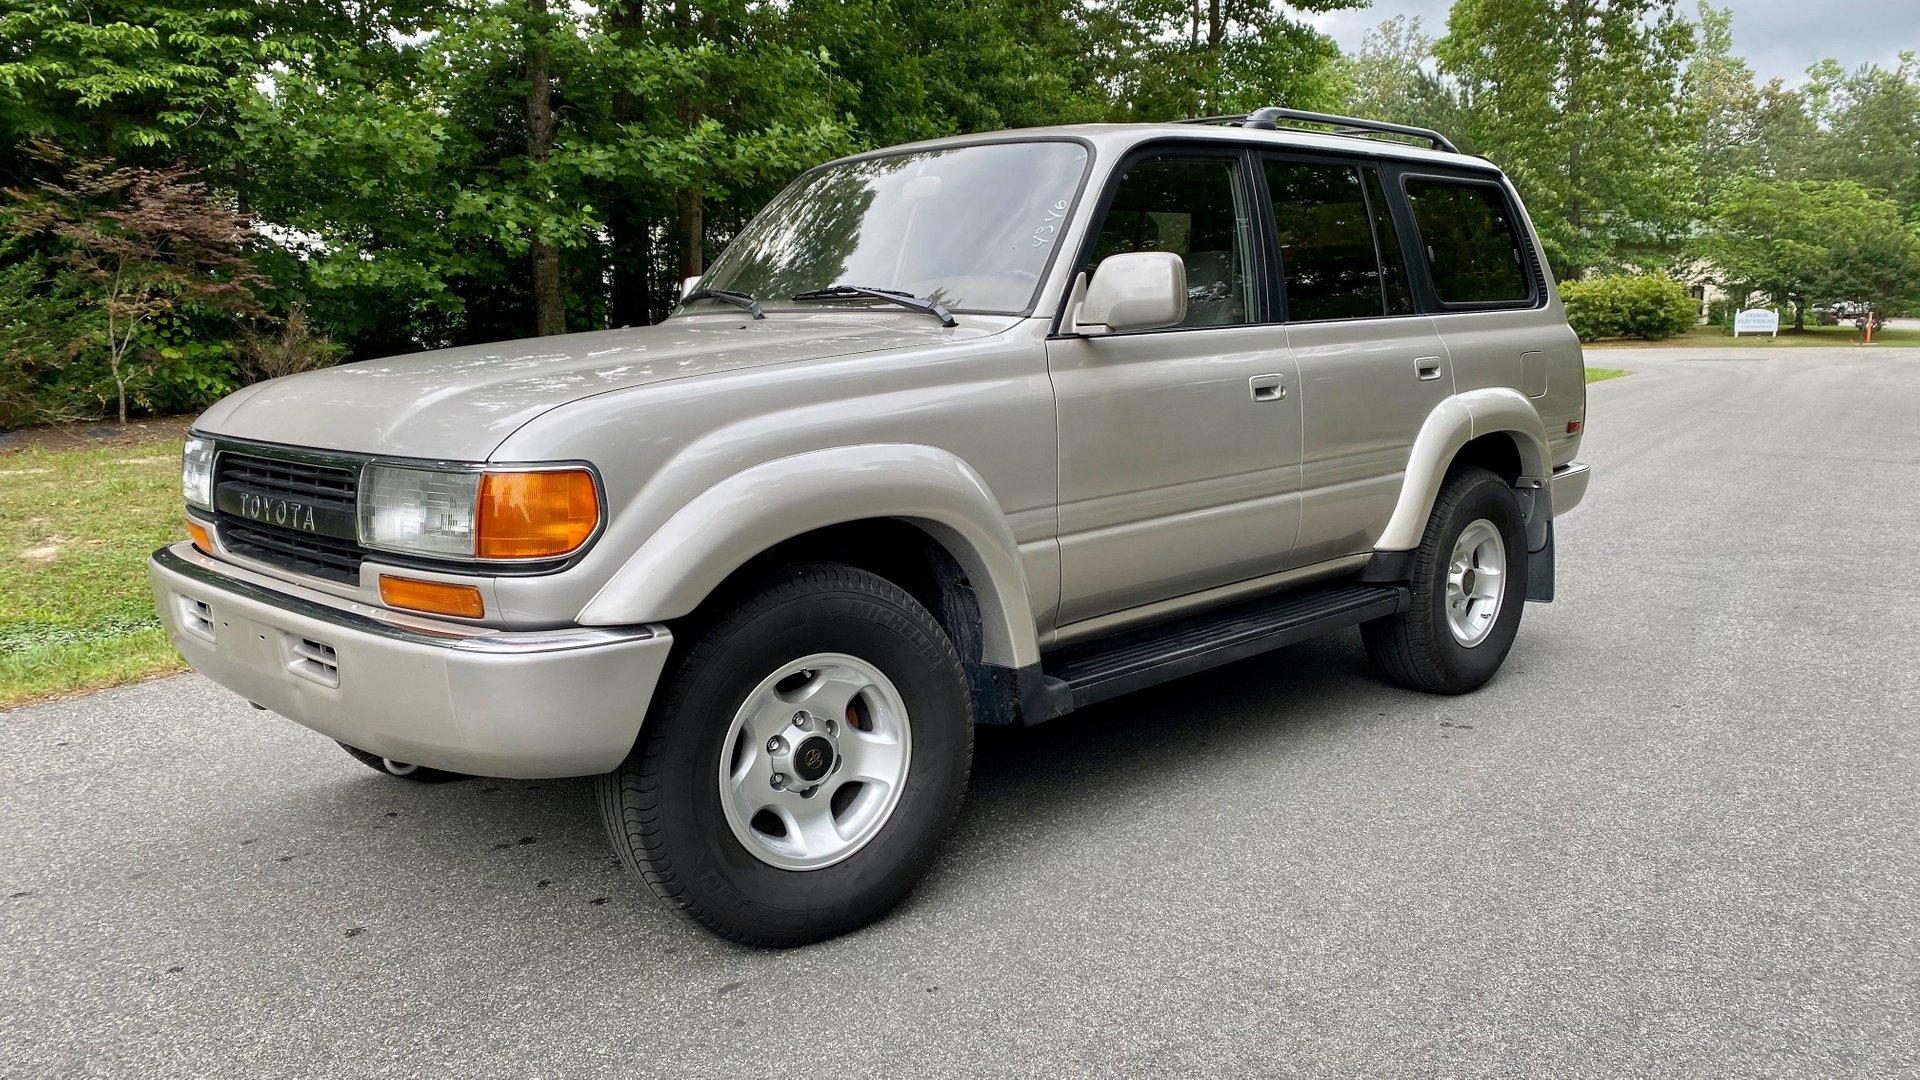 1994 toyota land cruiser 4dr wagon